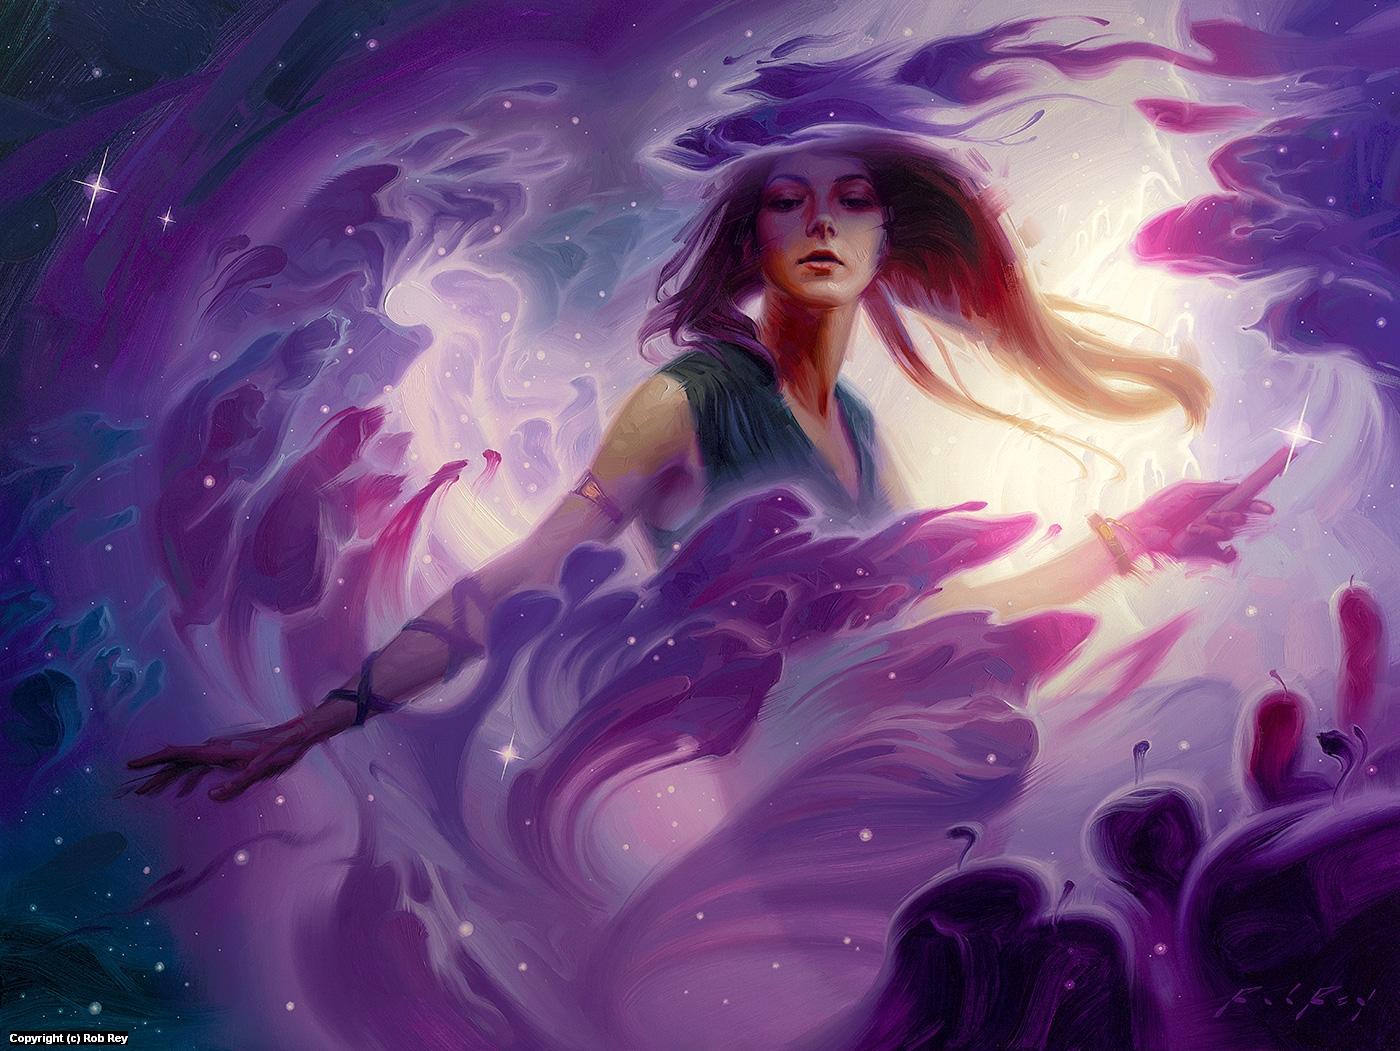 Fusion Lighting the Stars Artwork by Rob Rey